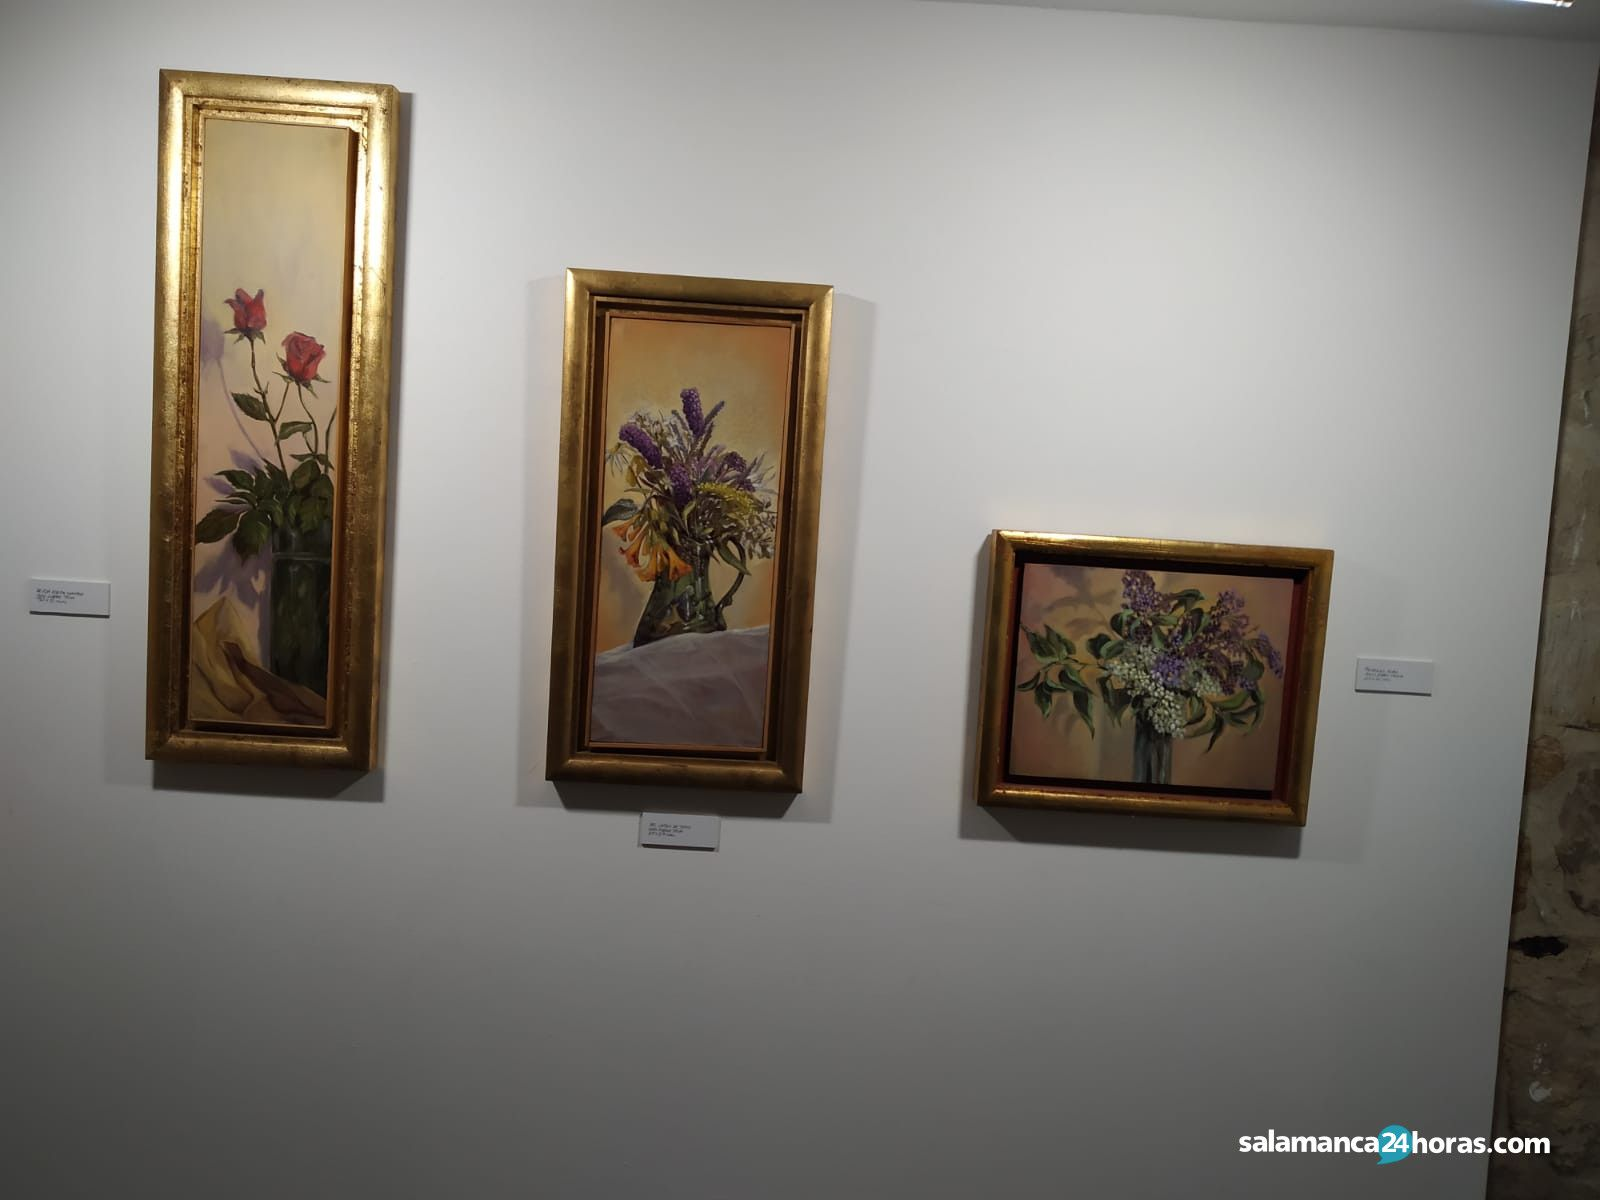 Exposicio?n Teresa SartoWhatsApp Image 2020 03 06 at 11.34.48